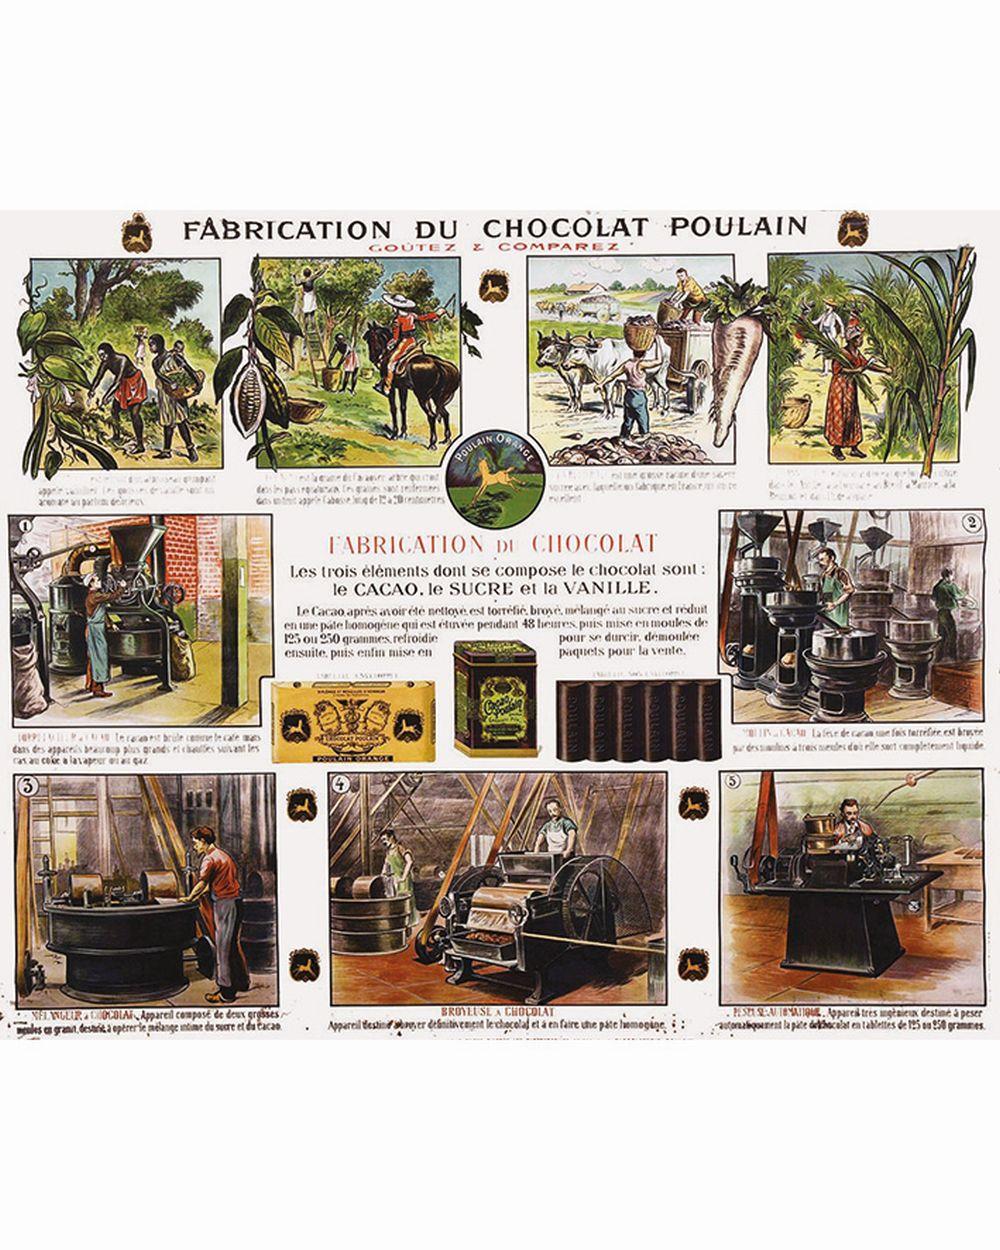 Fabrication du Chocolat Poulain     vers 1900